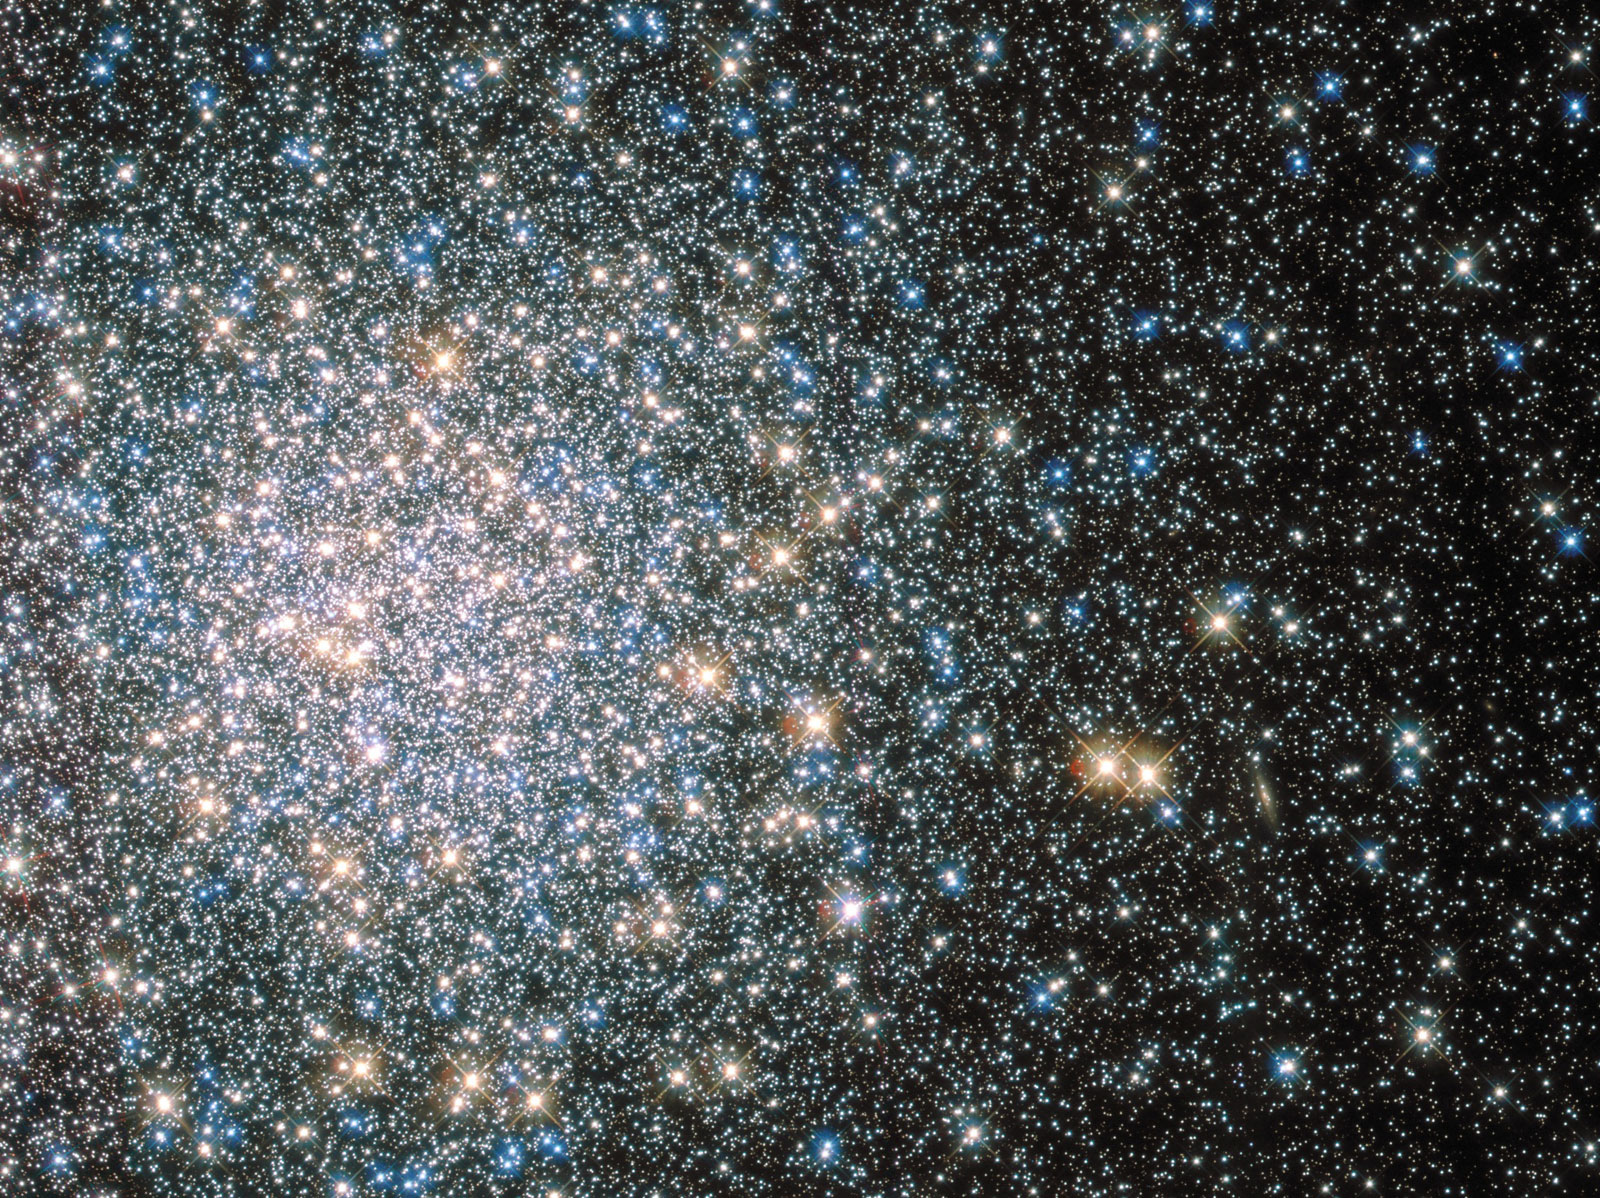 O Messier 5 do Hubble